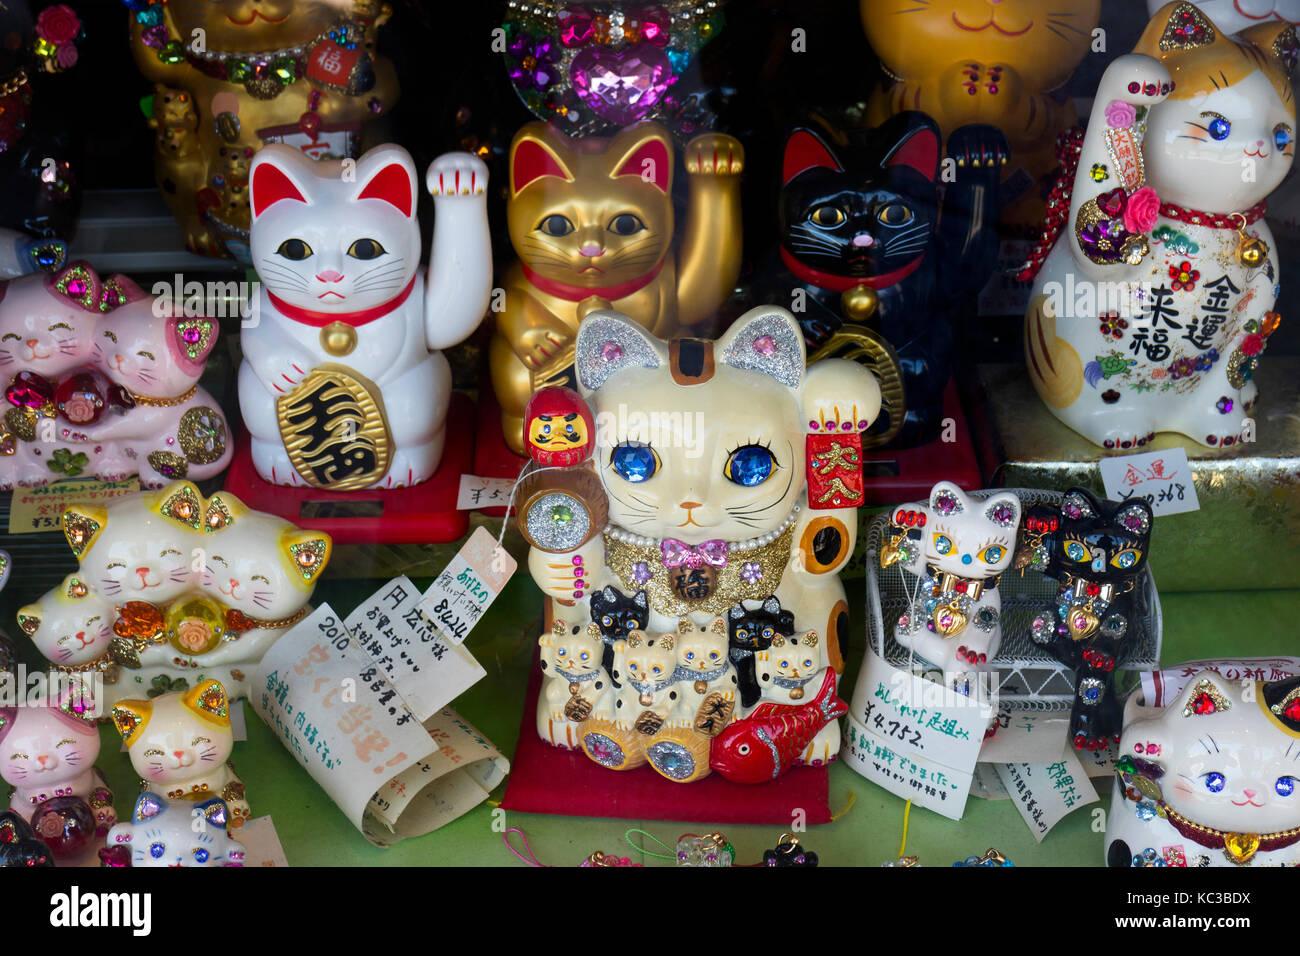 Kyoto, Japan - 18. Mai 2017: Verschiedene traditionelle Manekineko, lucky Katzen als Mitbringsel oder Geschenk Stockbild